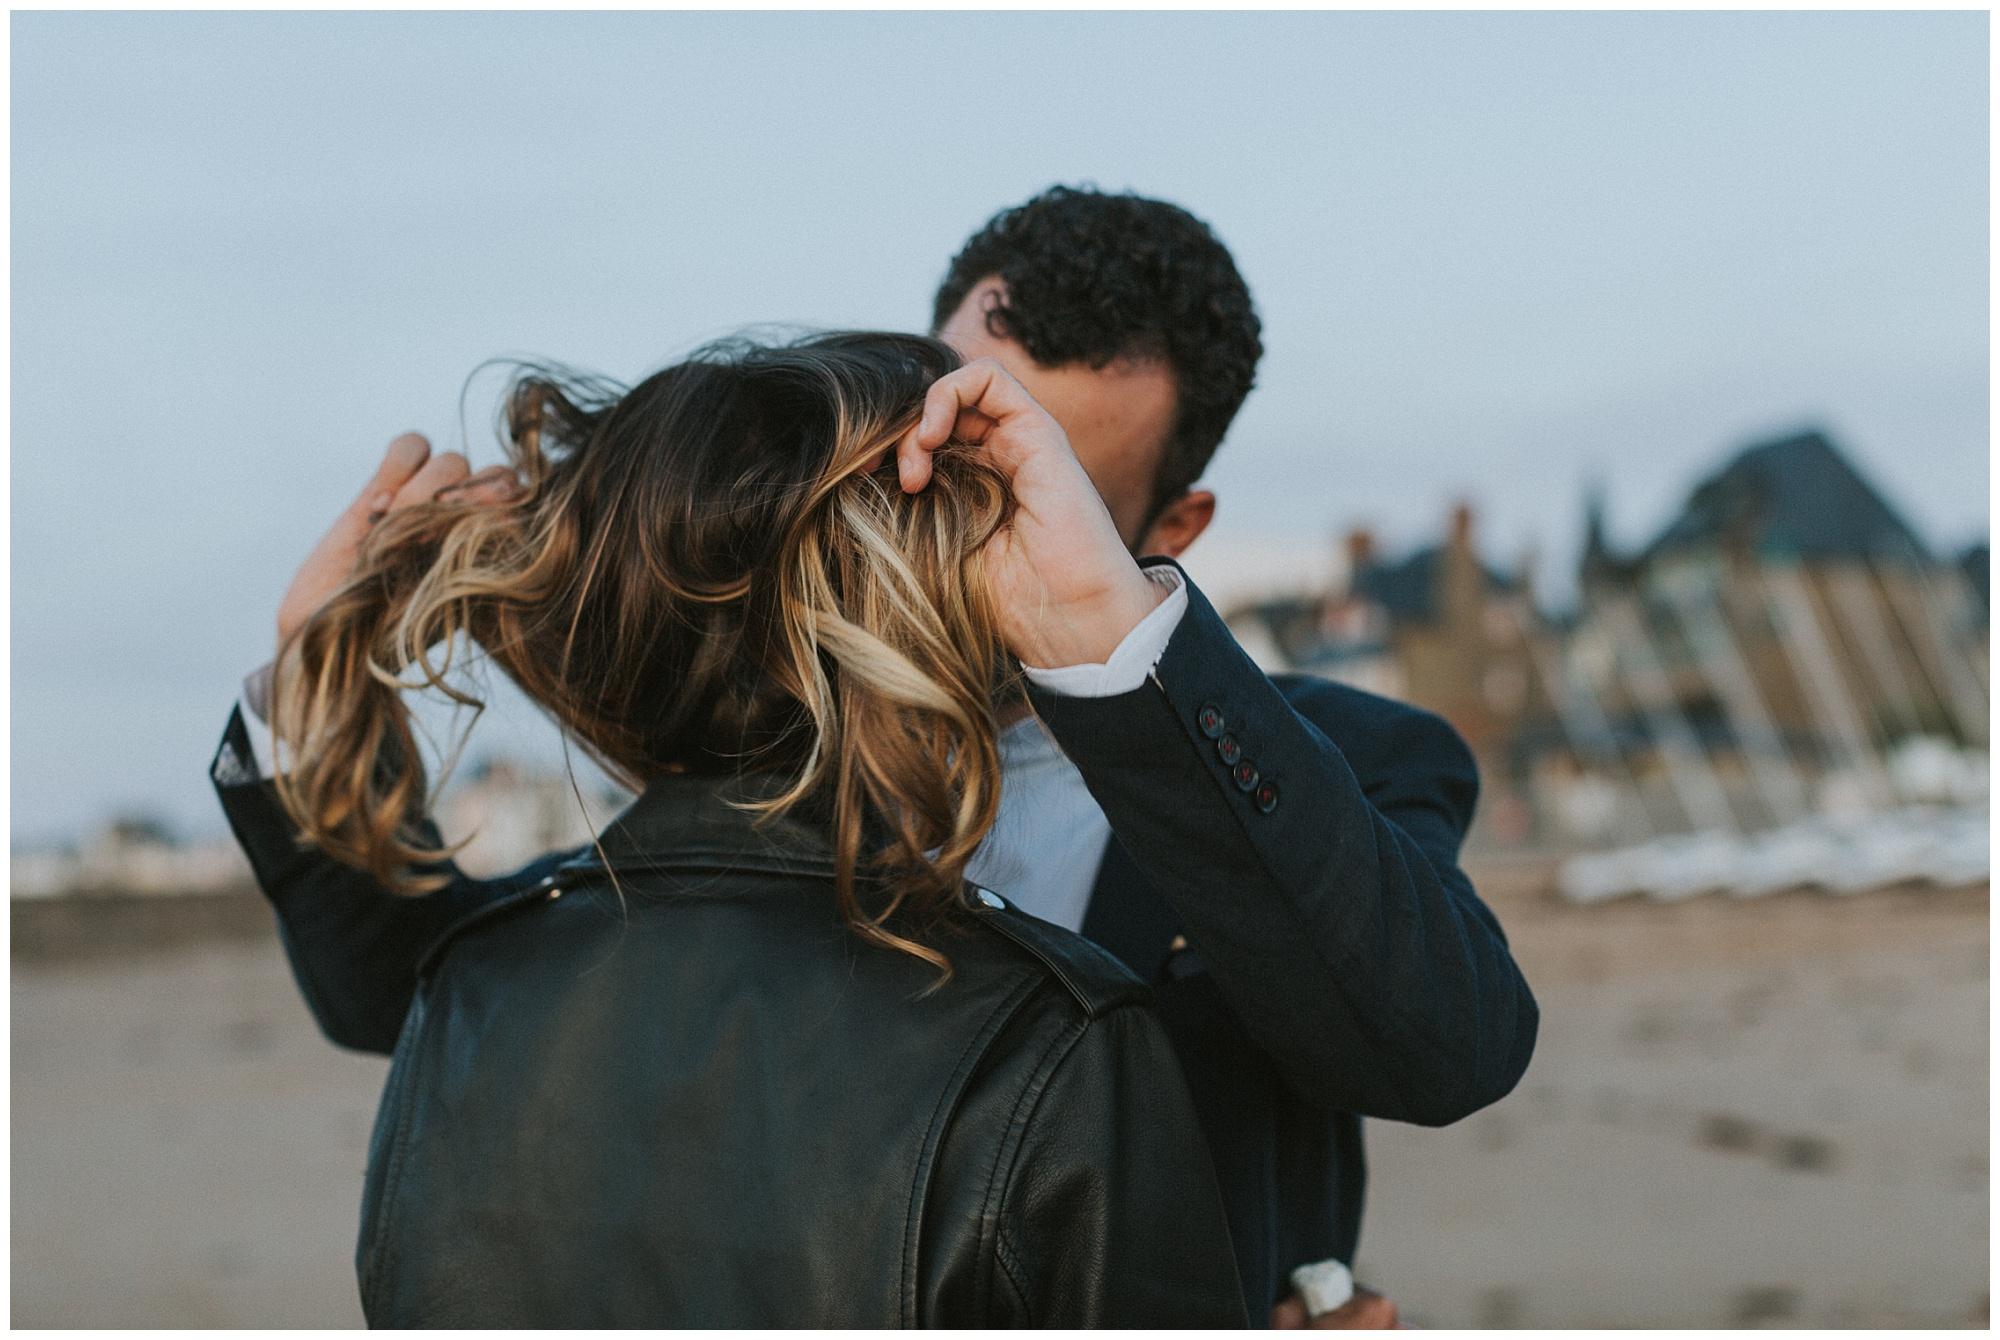 Kateryna-photos-photographe-mariage-bretagne-saint-malo-finistere-cotes-darmor-wedding_0099.jpg